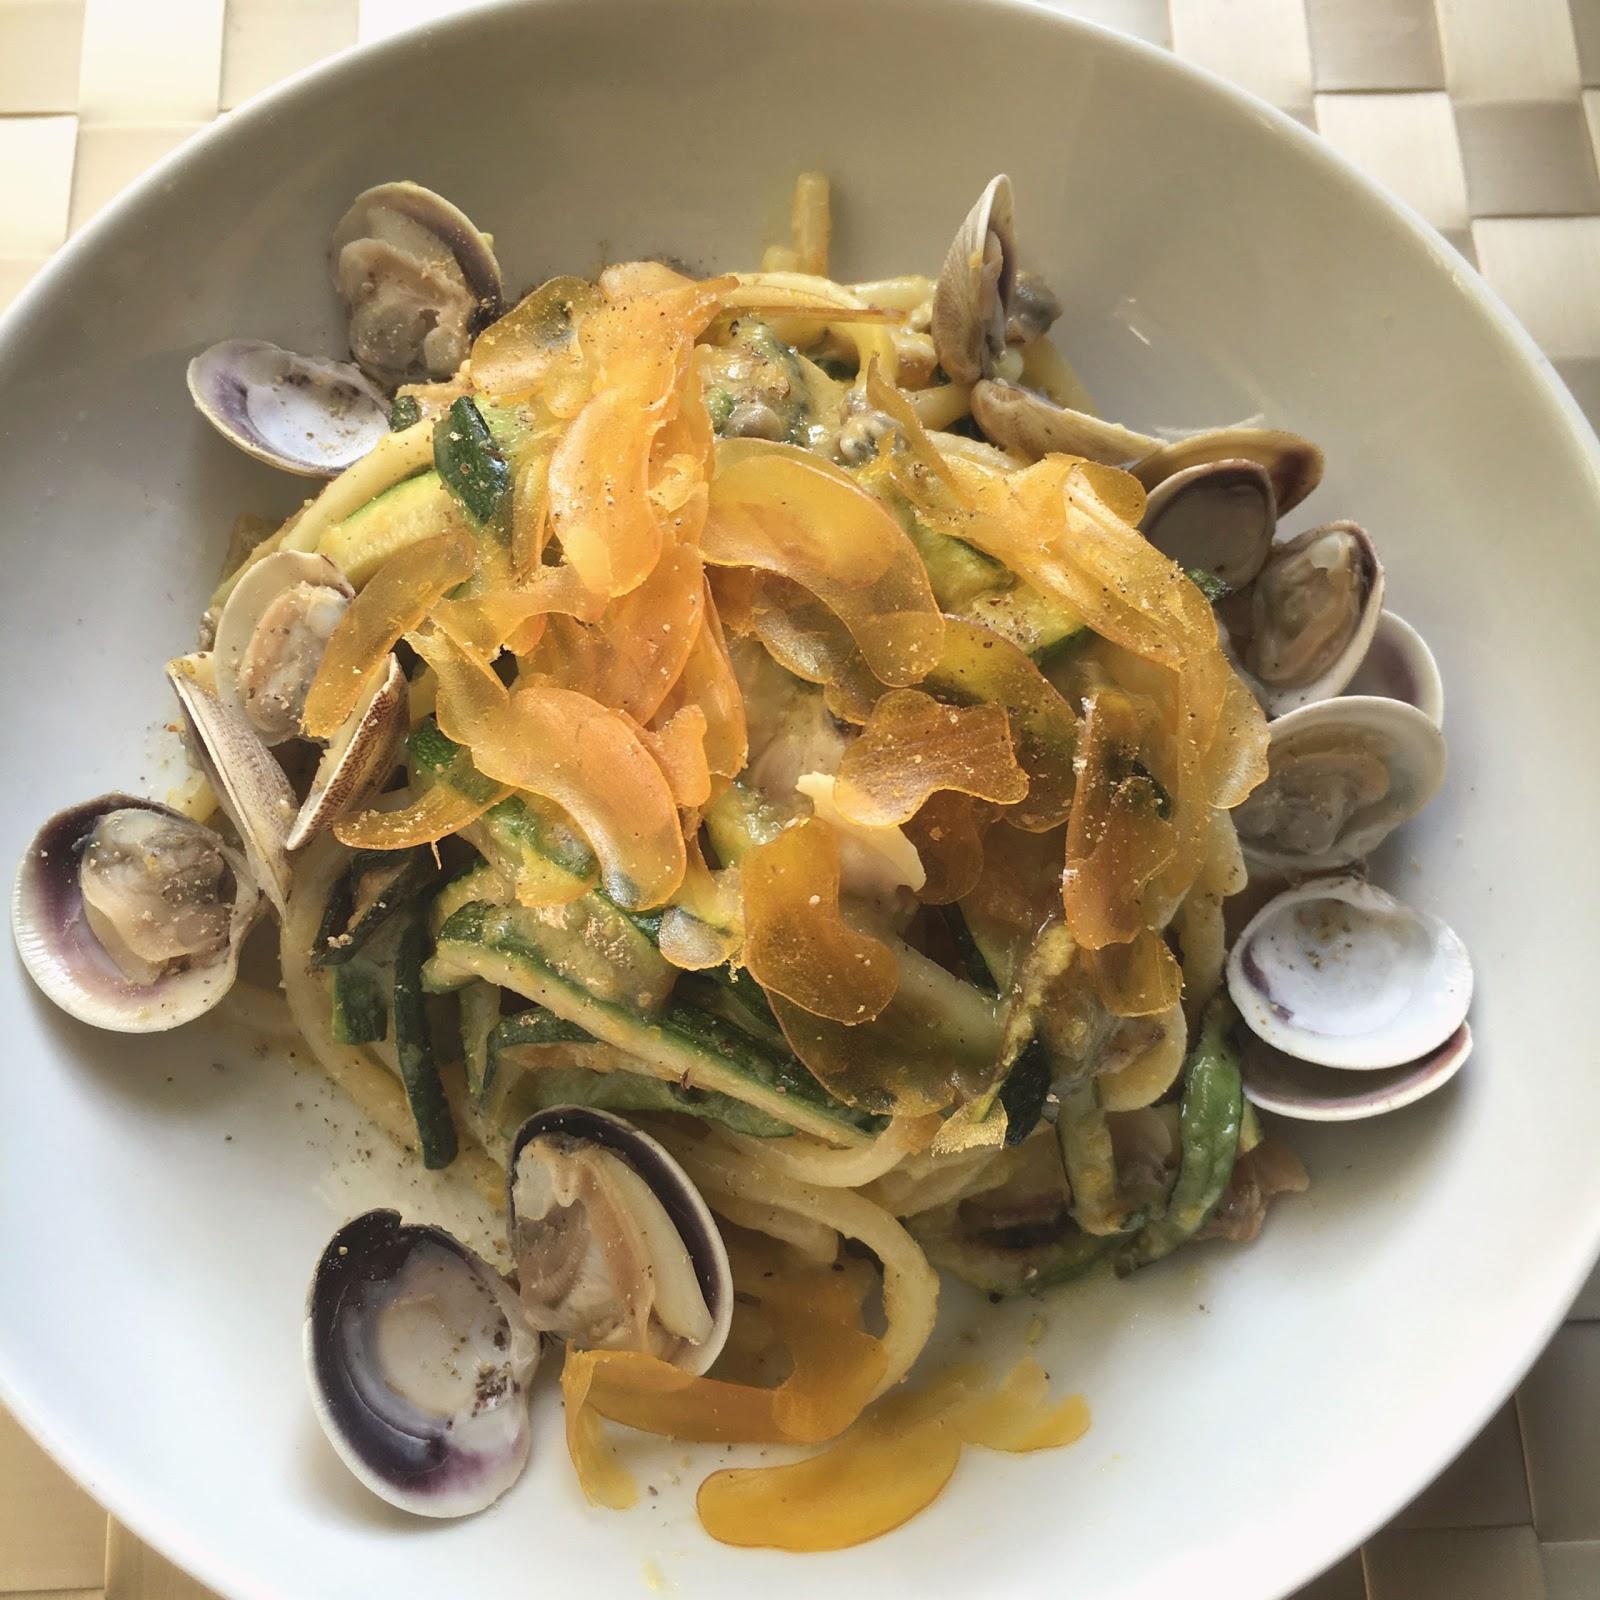 Lemon flavored spaghetti with clams, zucchini and bottarga